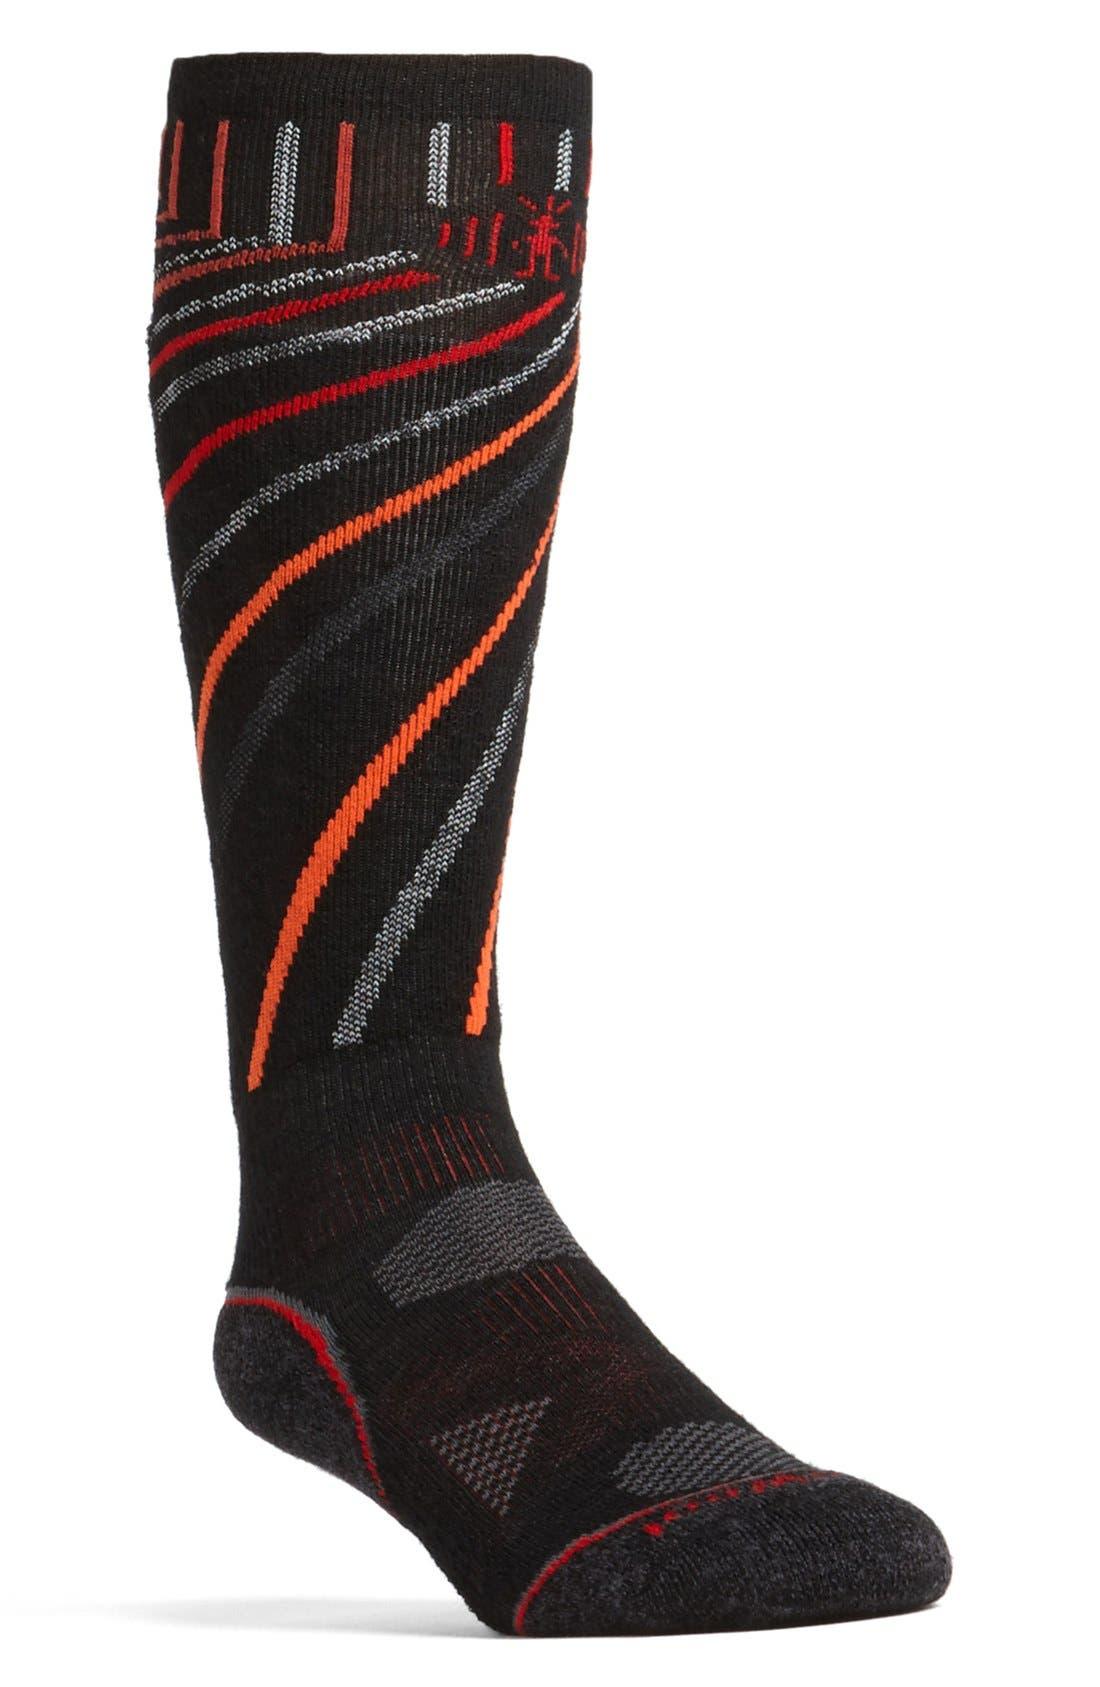 Alternate Image 1 Selected - Smartwool 'PhD - Light' Snowboard Socks